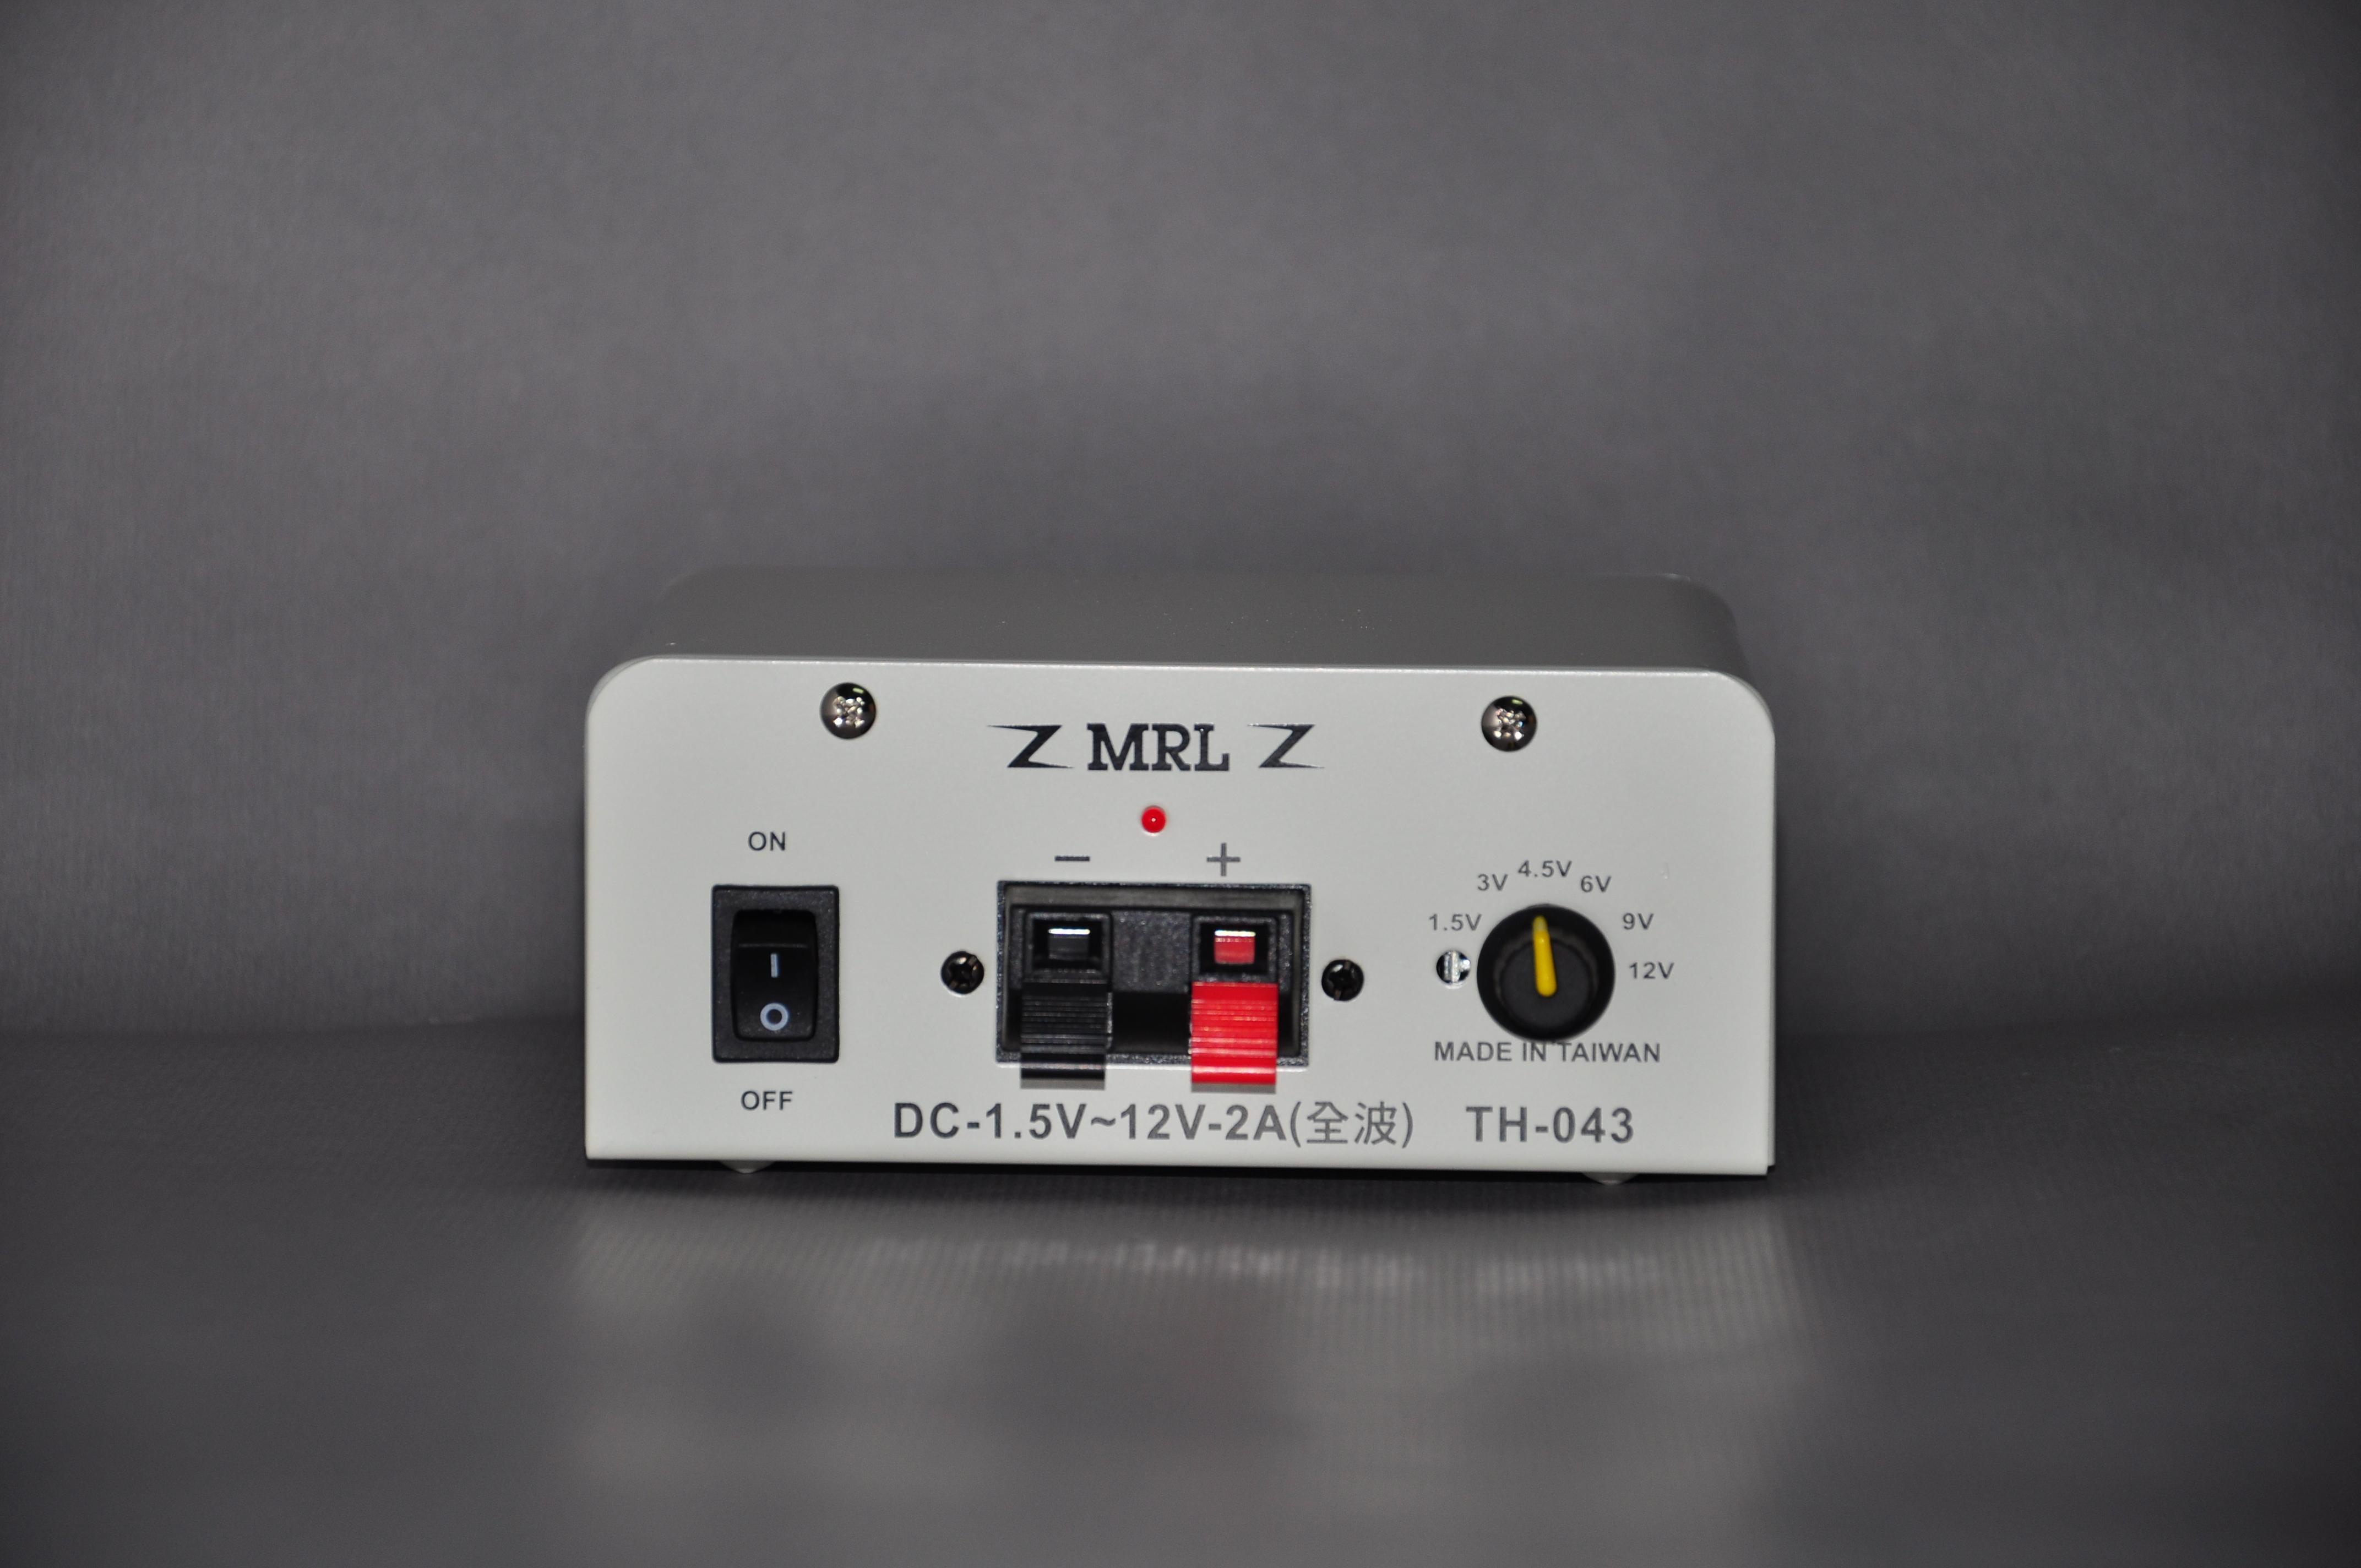 TH-043